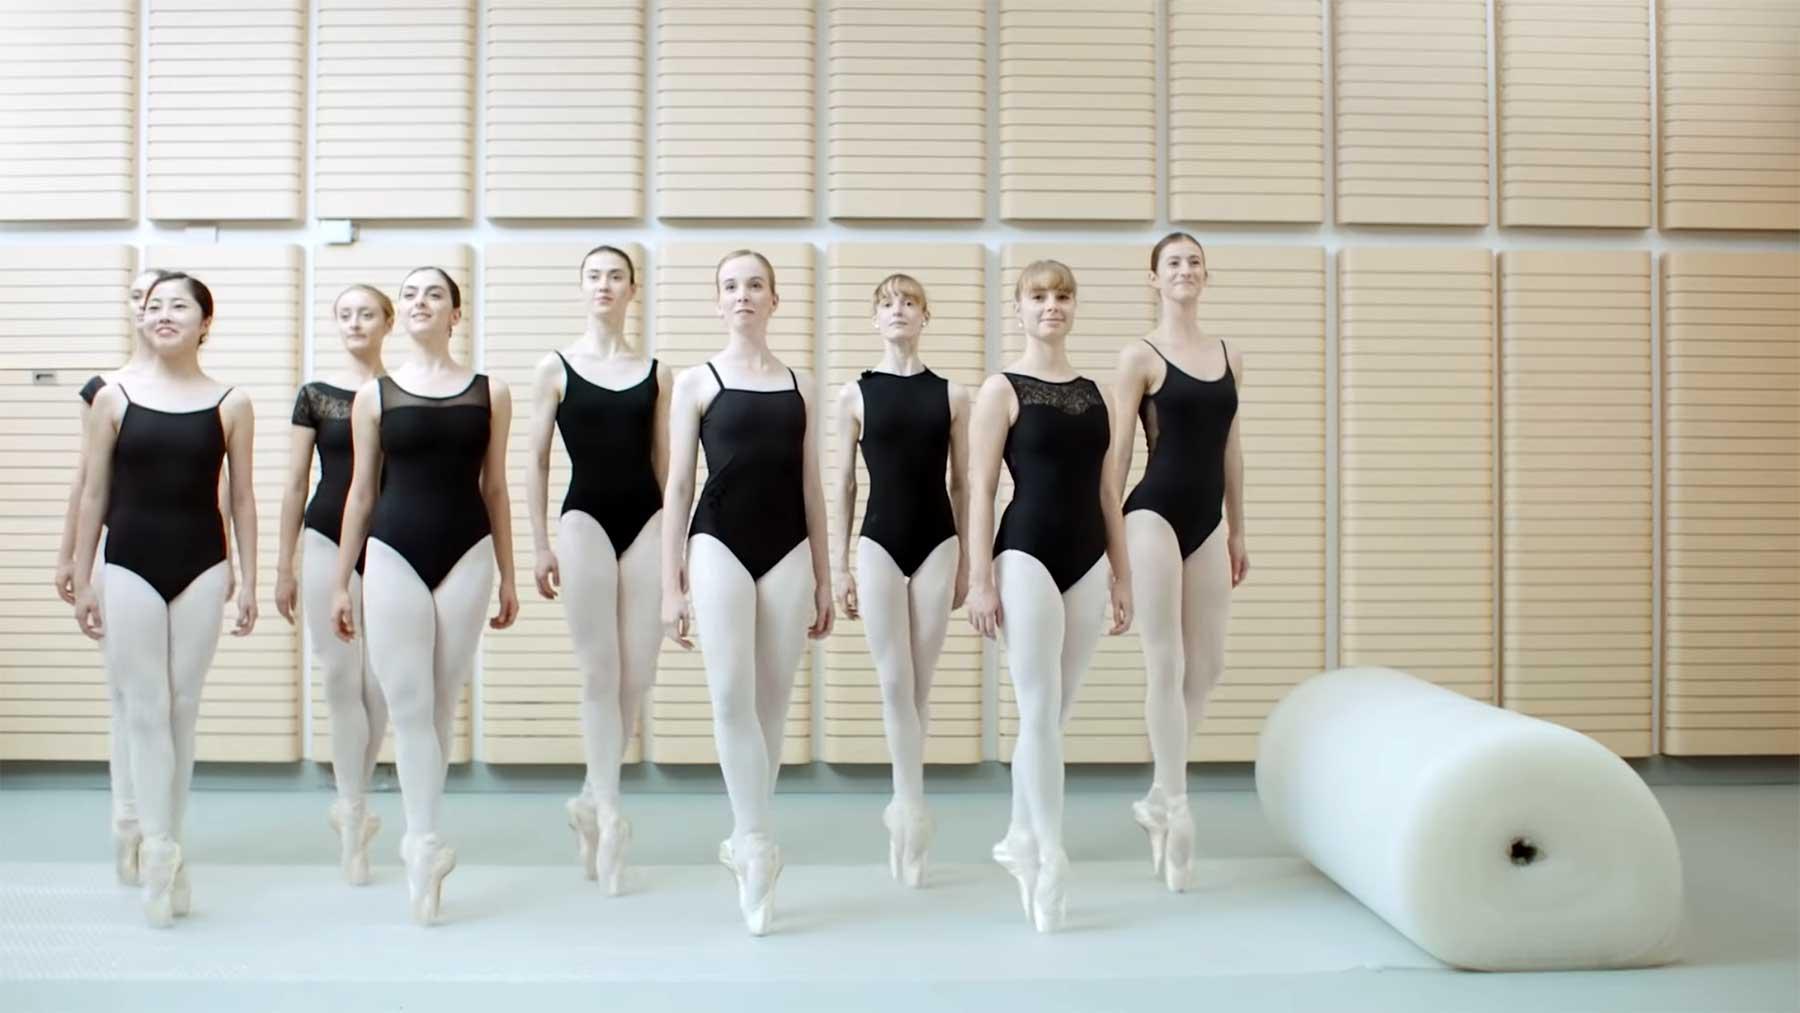 Ballett-Tänzerinnen tippeln auf Luftpolsterfolien ballettaenzerinnen-auf-luftpolsterfolie